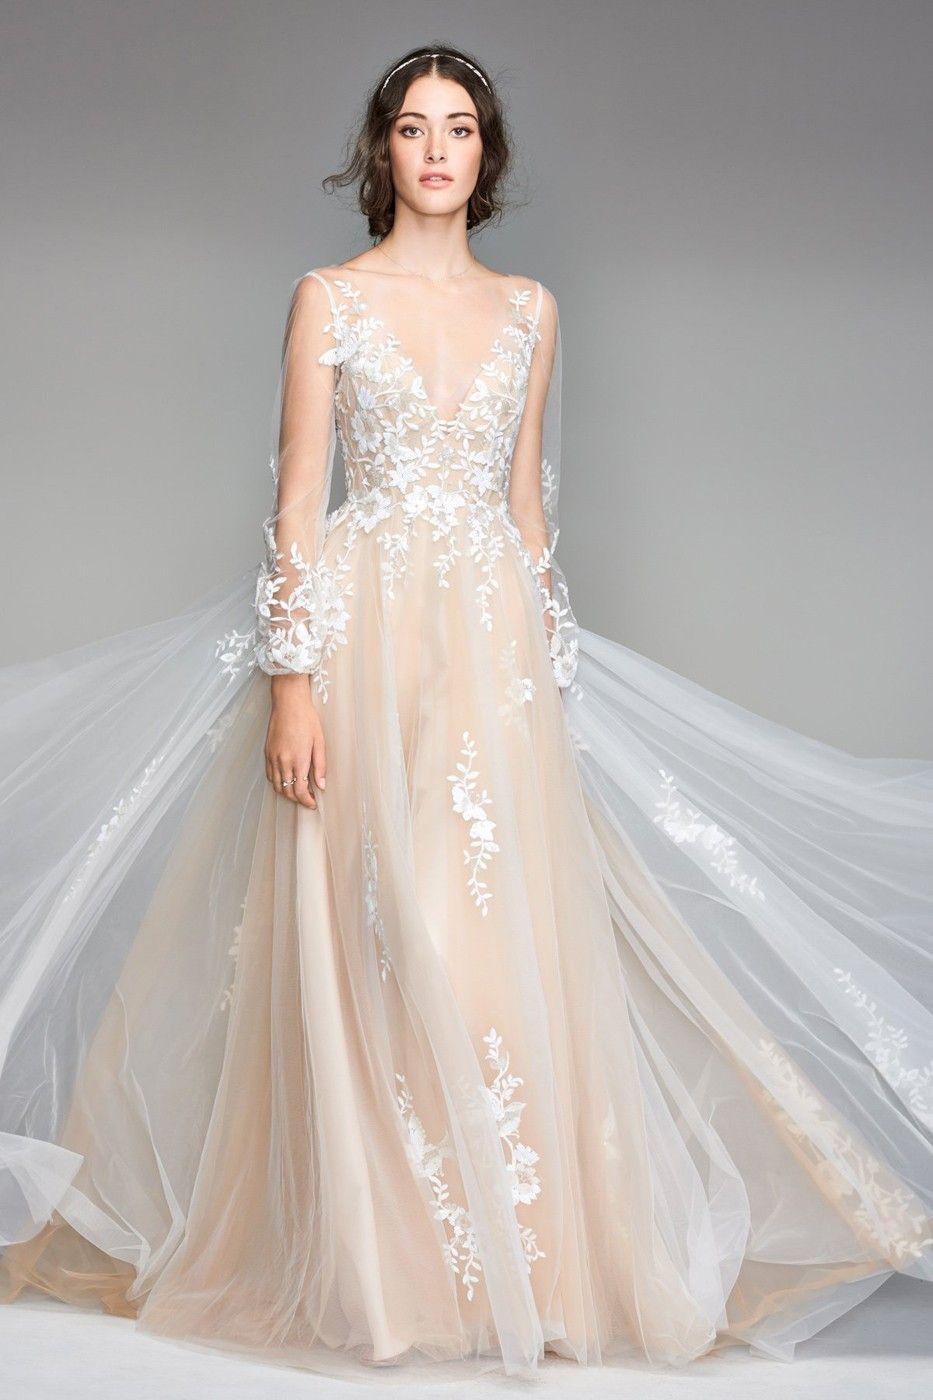 29+ Willowby wedding dress saros ideas in 2021